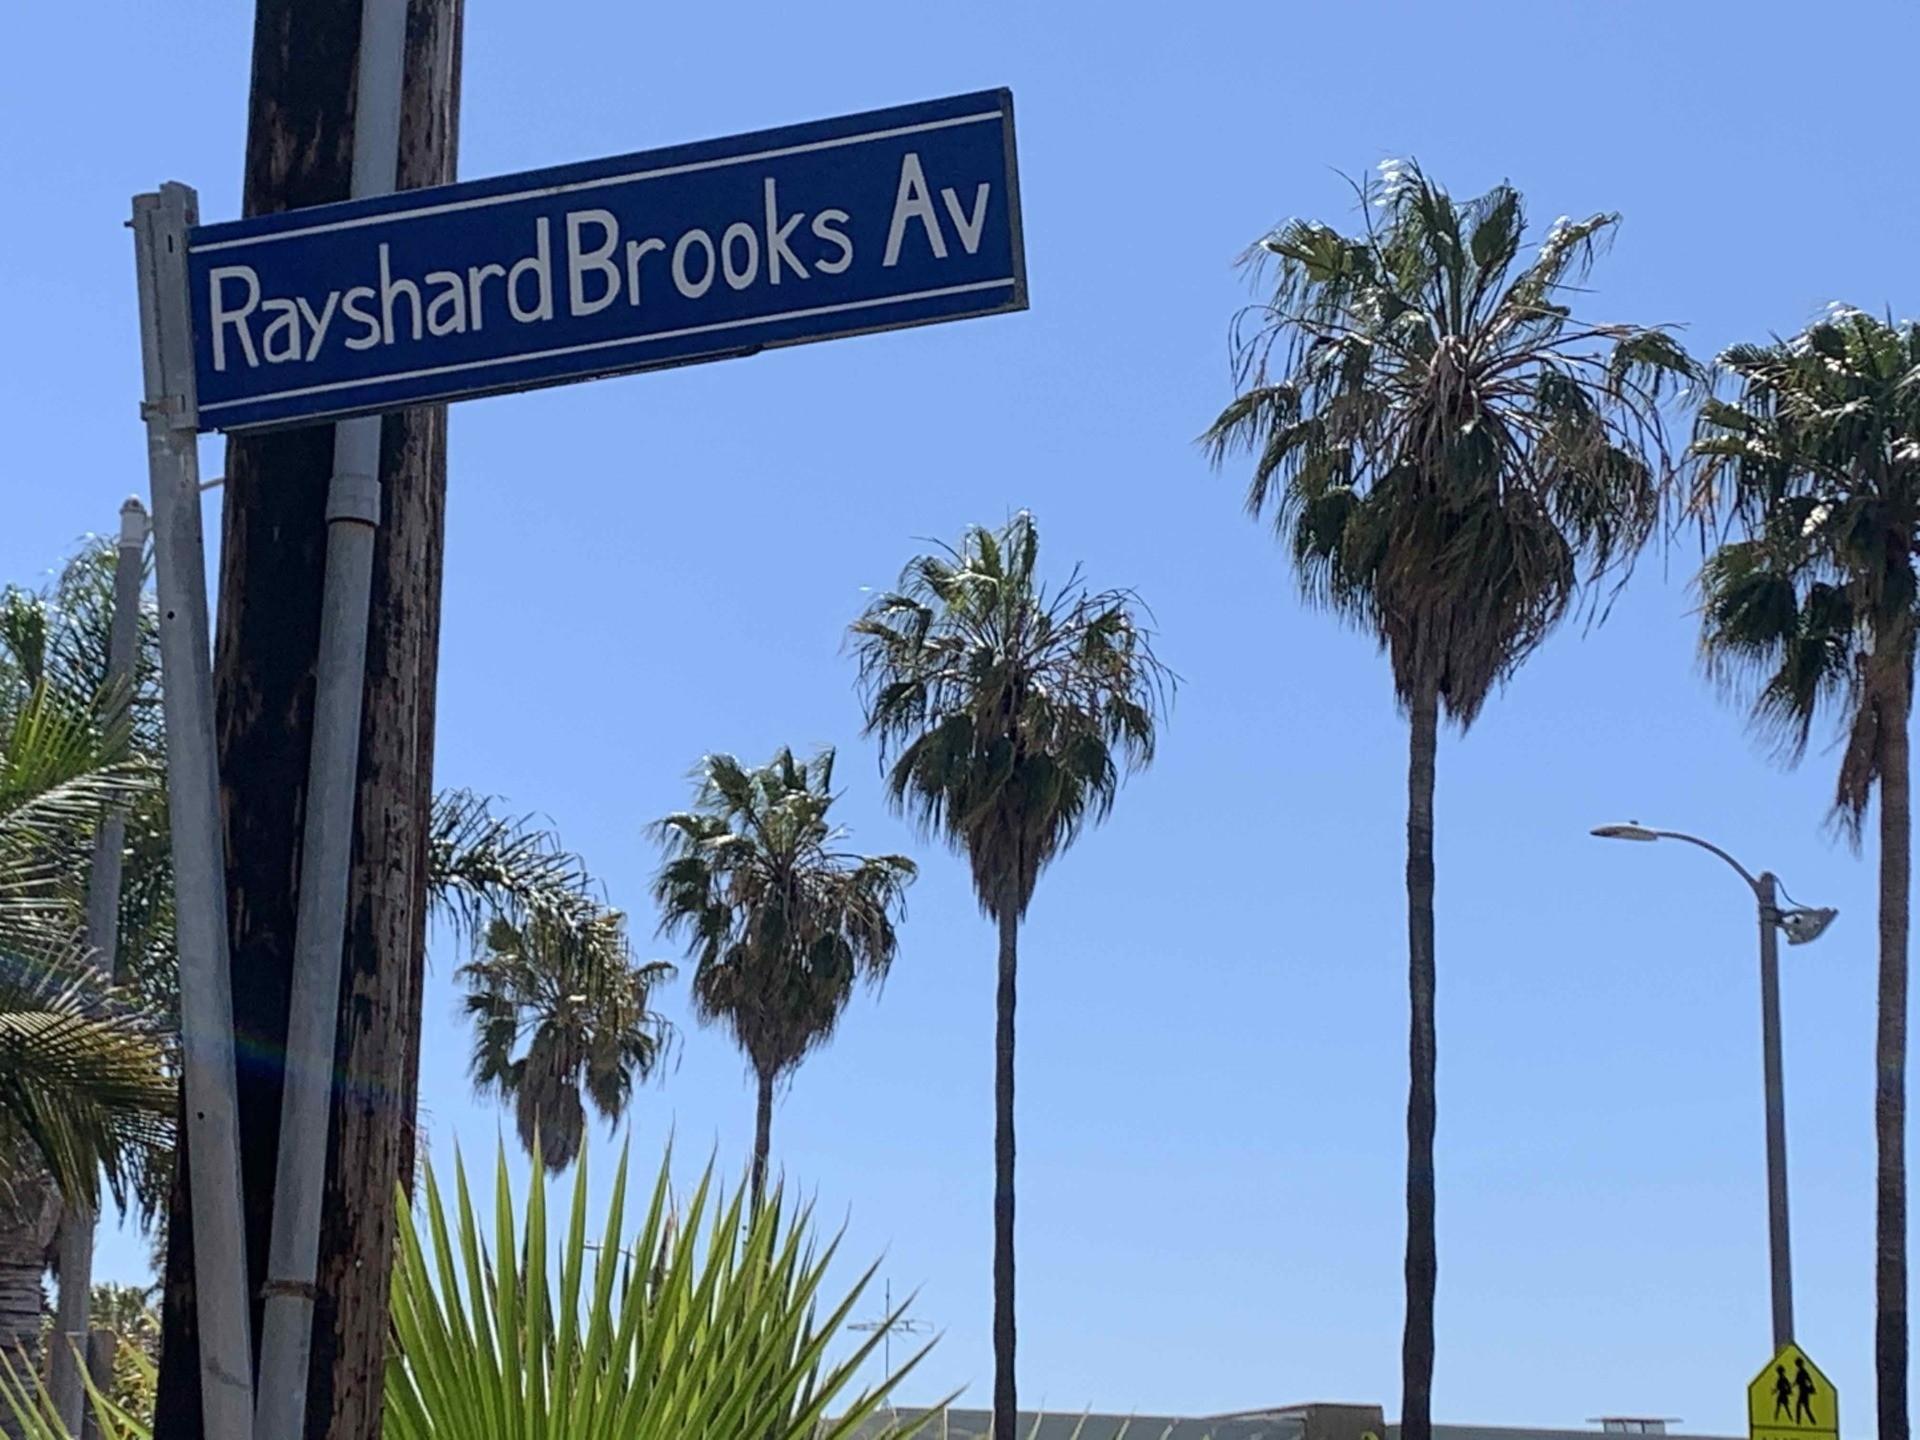 """Rayshard Brooks Avenue"" sign in Venice, California, April 28, 2021 (Joel Pollak / Breitbart News)"